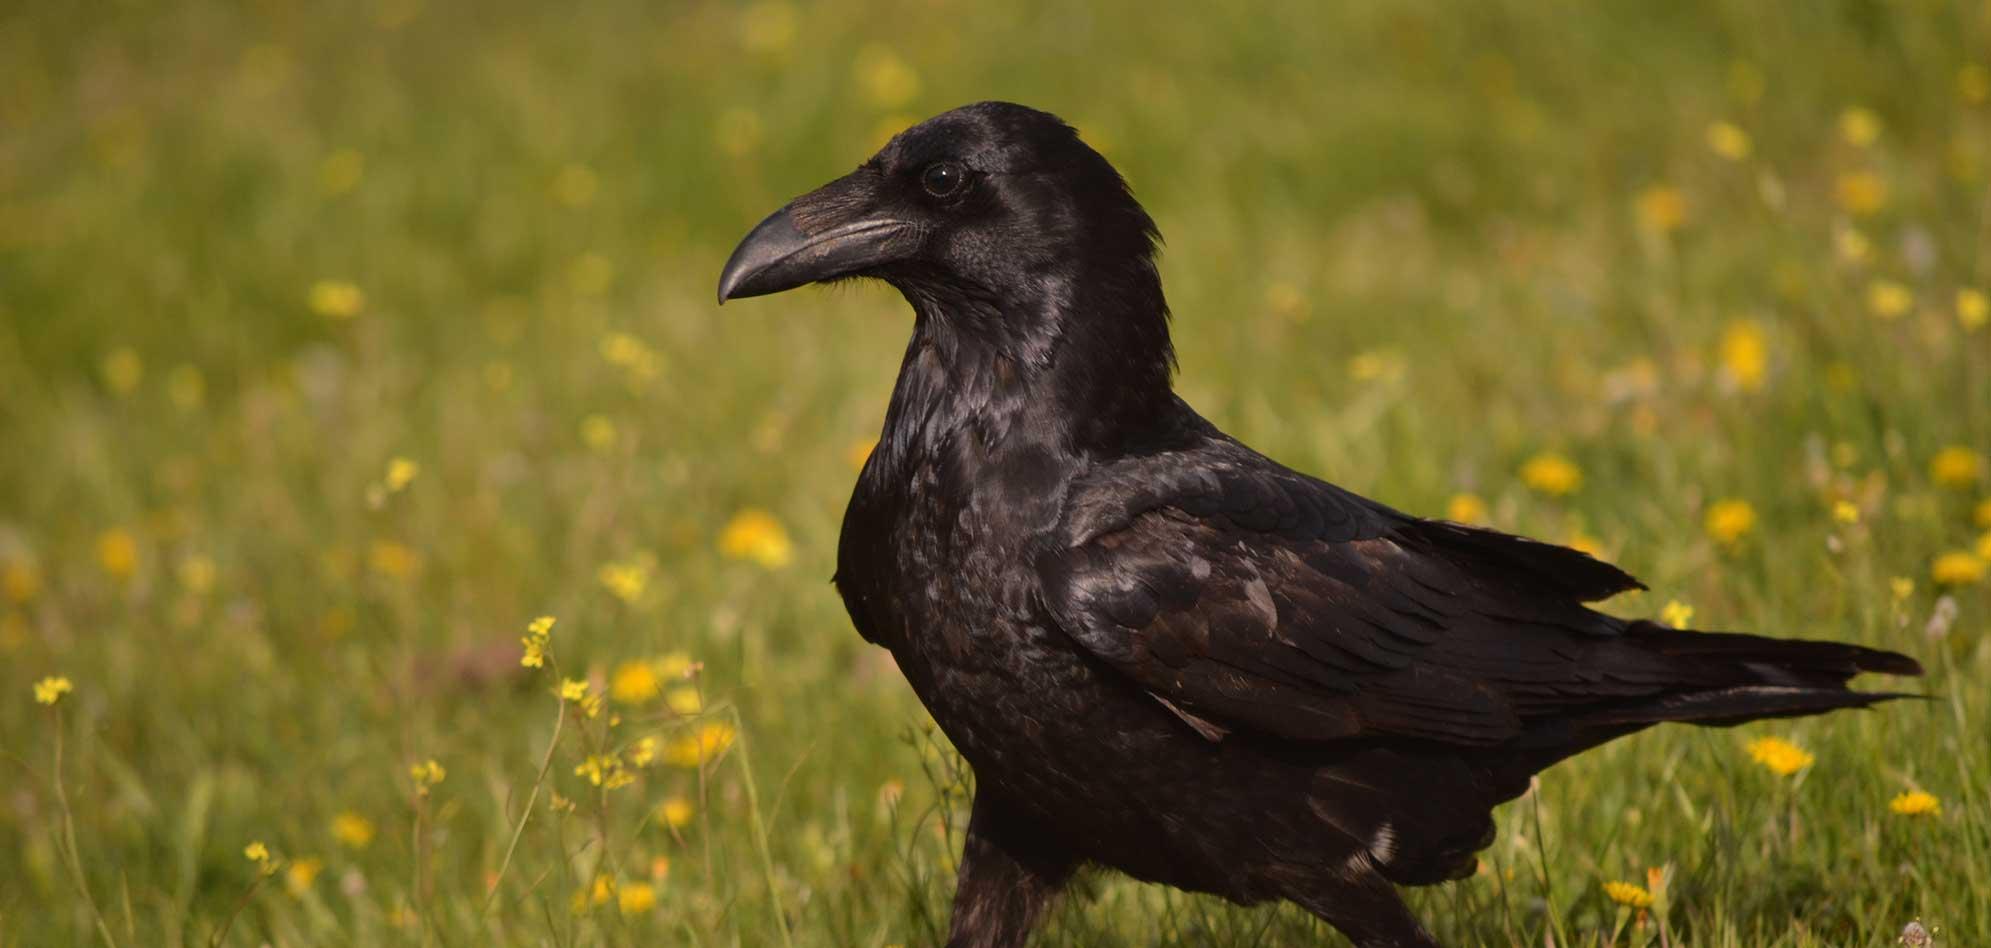 fotografiar cuervo